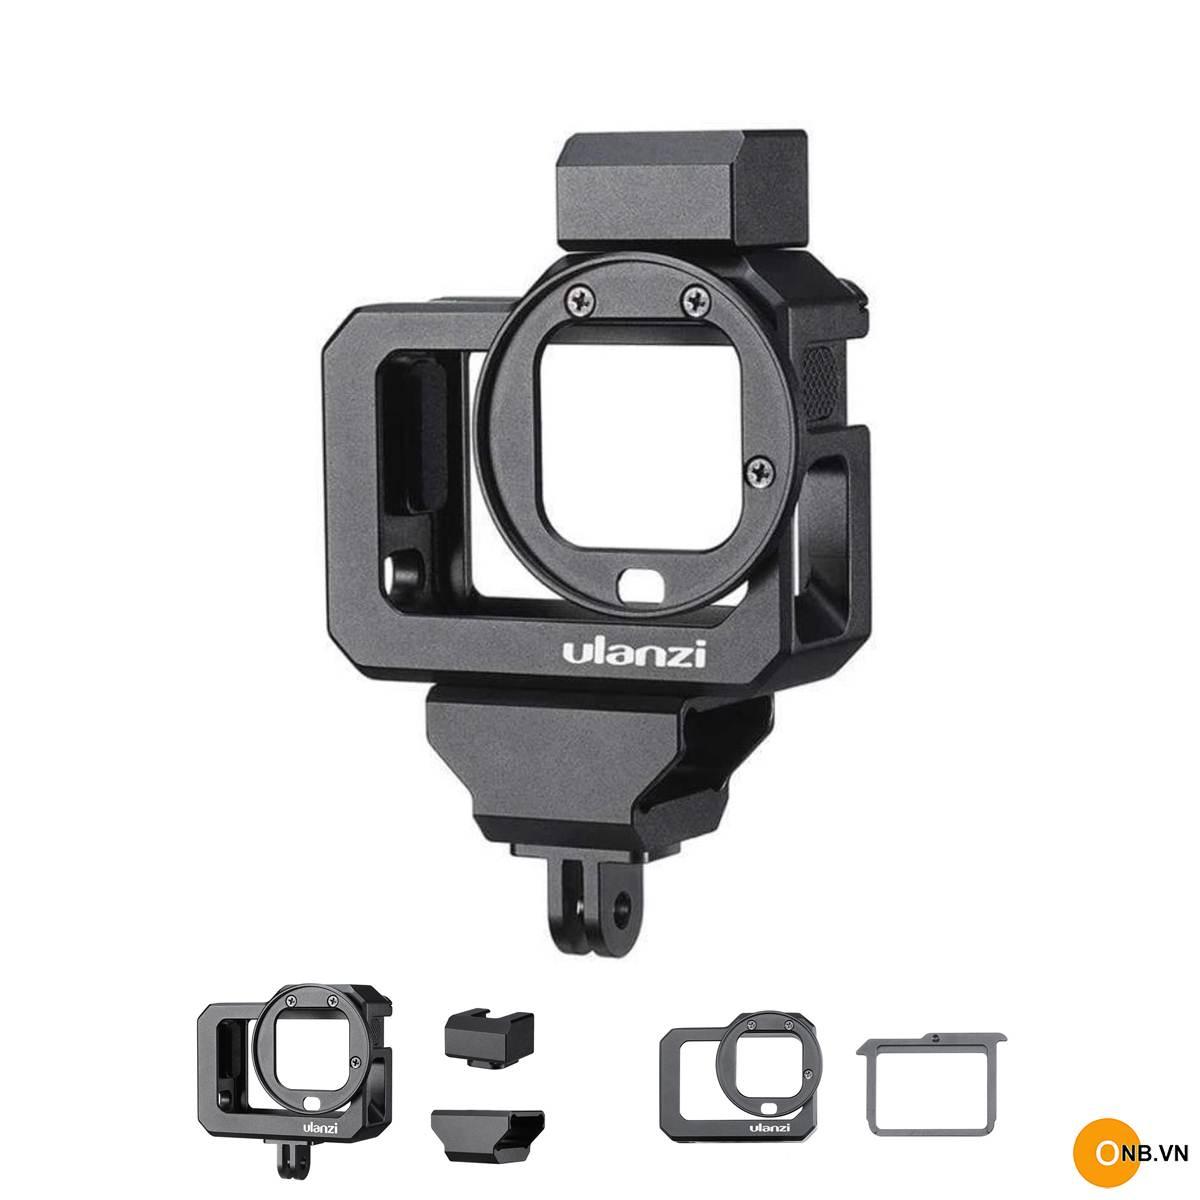 ULANZI G8-5 khung hợp kim Vlog cho Gopro 8 new 2020